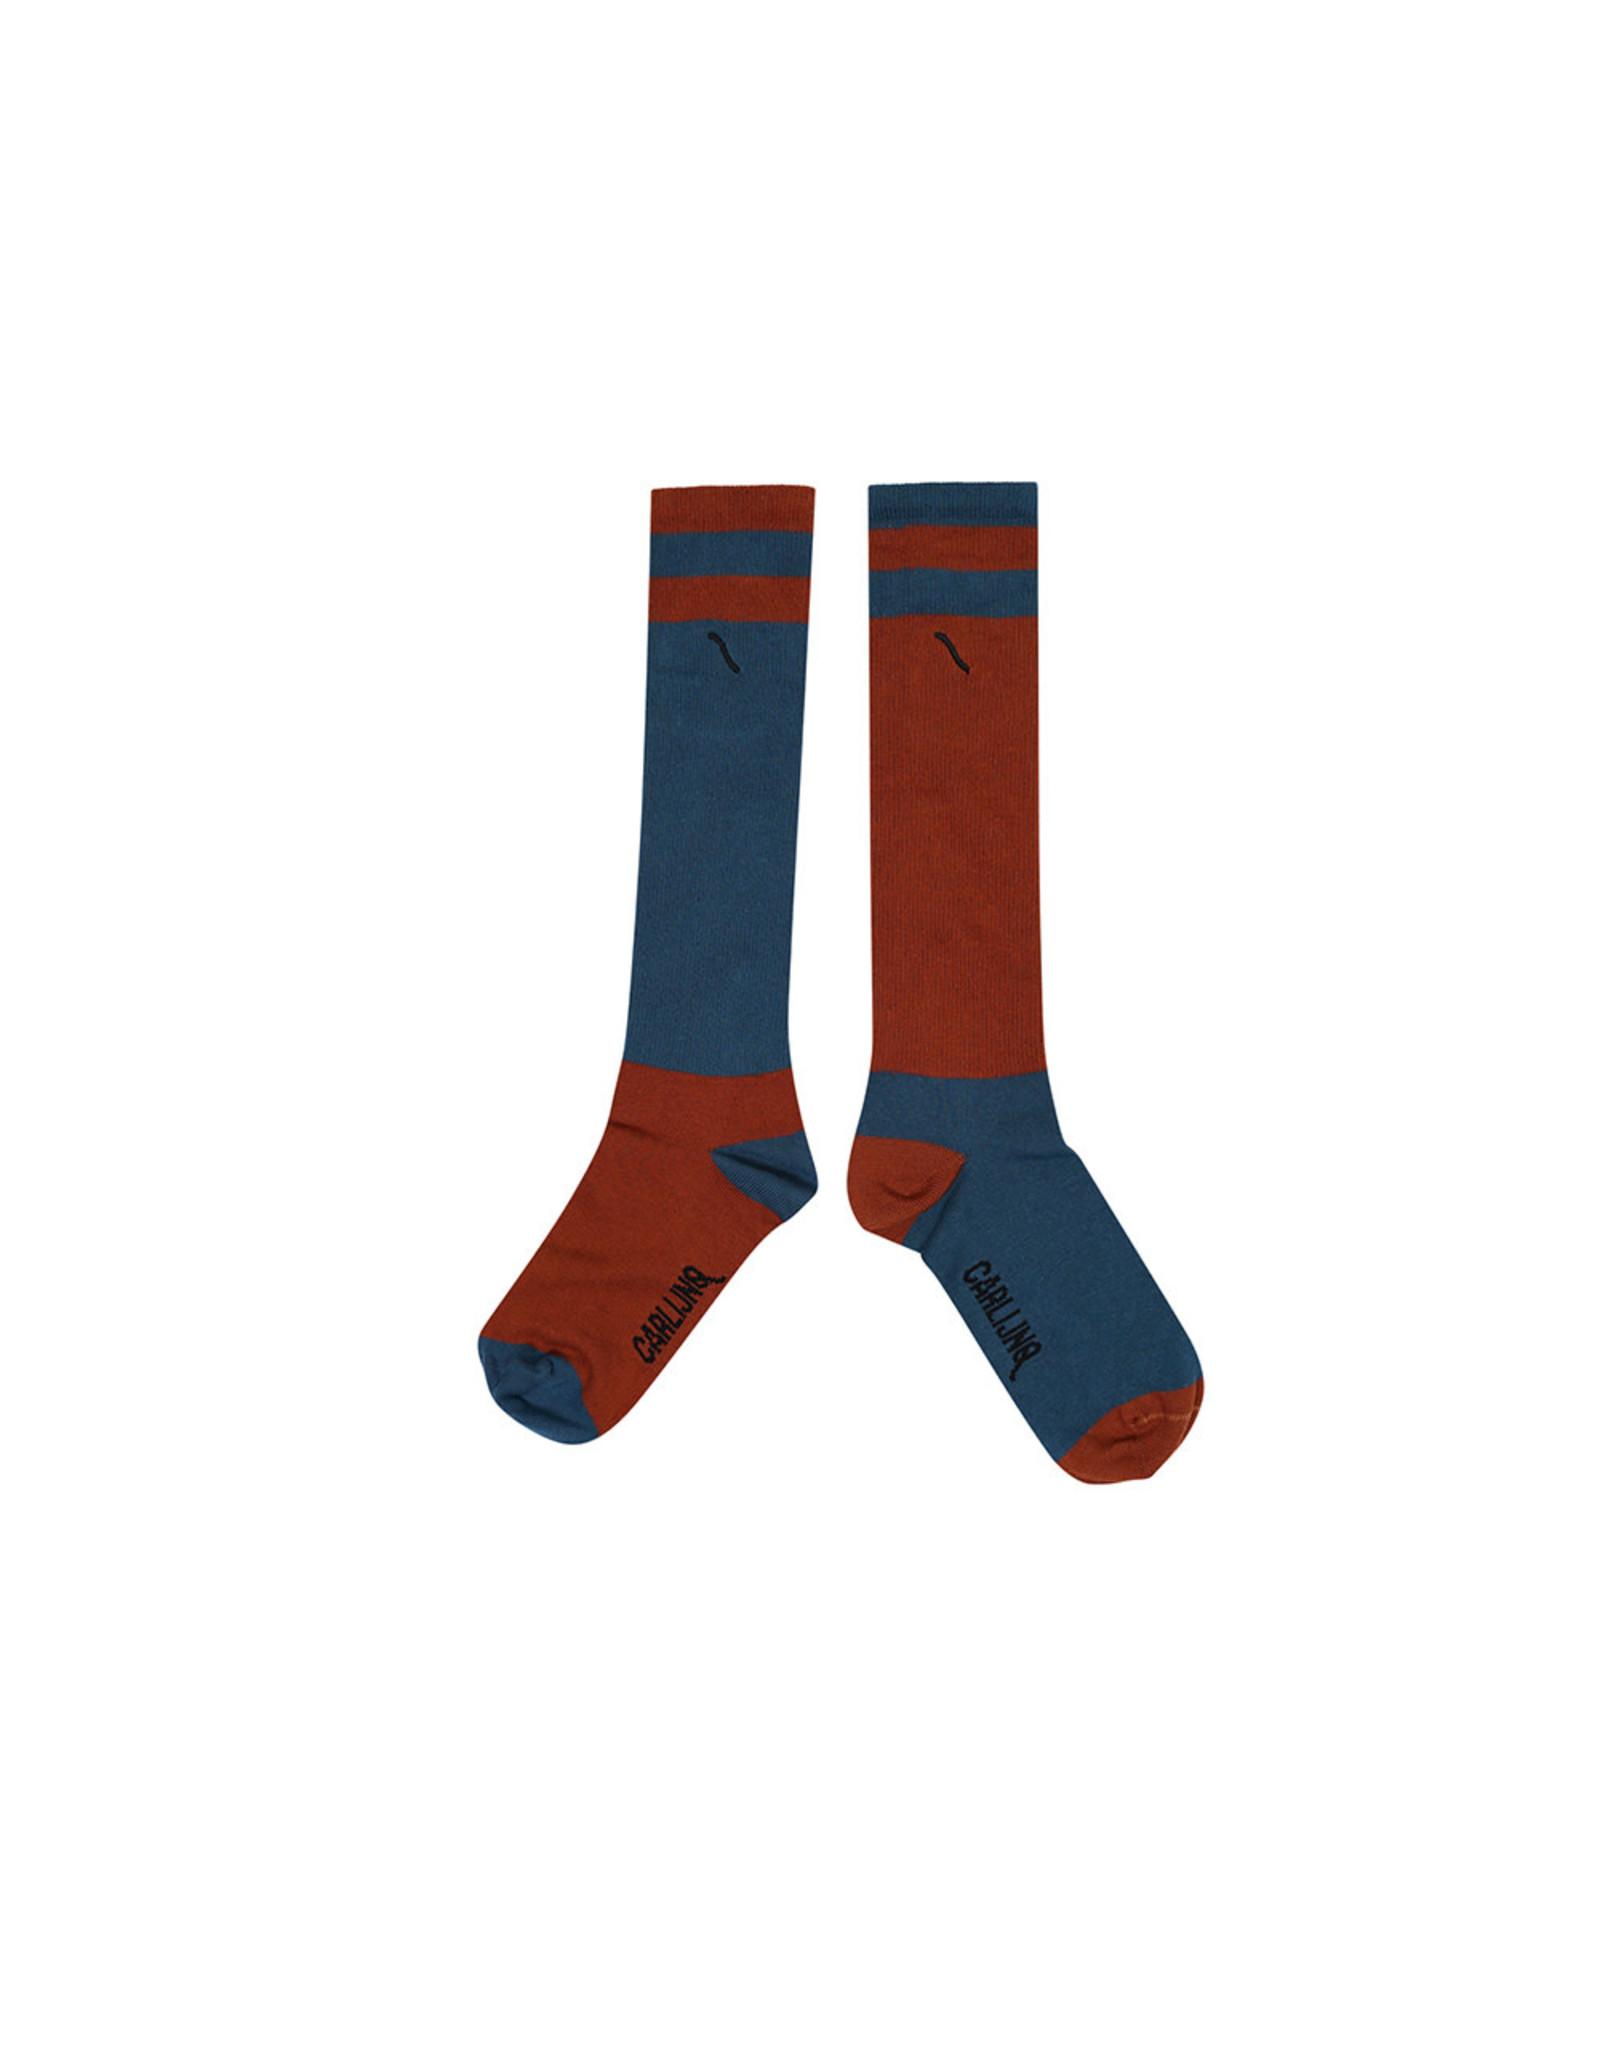 Carlijn Q Carlijn Q Knee Socks - Color Block Ginger/Blue